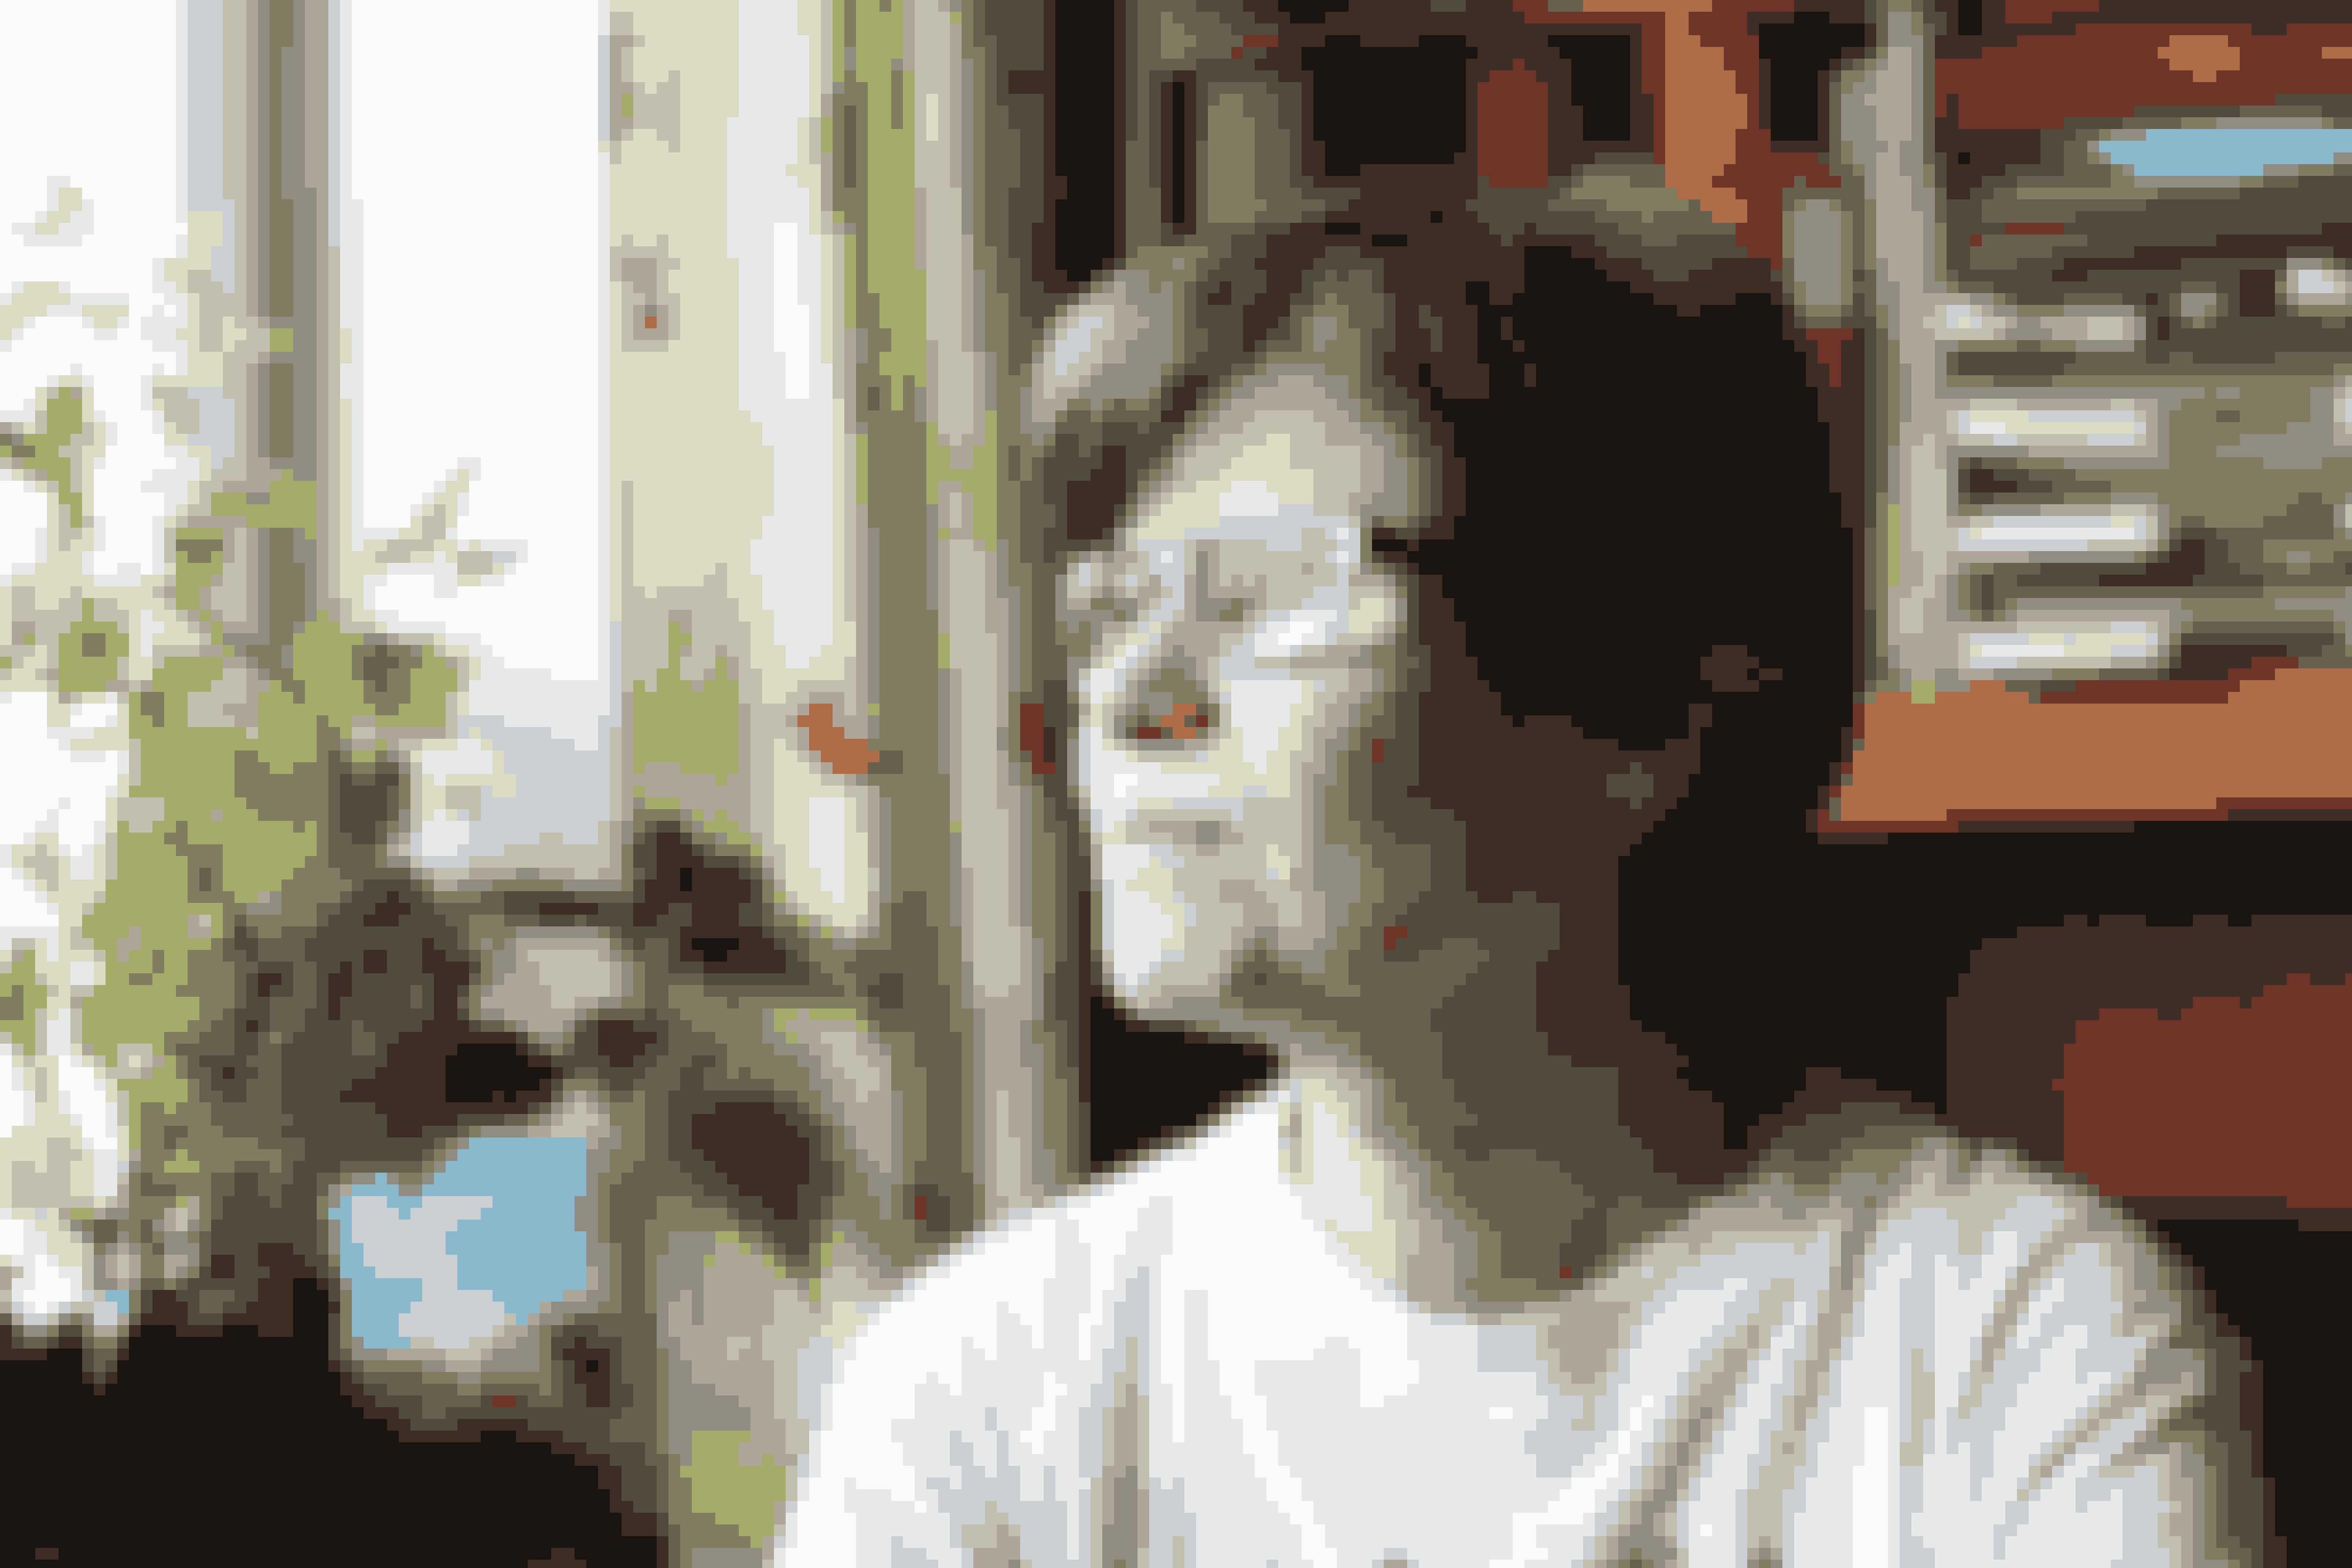 Viki mistede sin søn Toumas. Han blev kun 22 år.